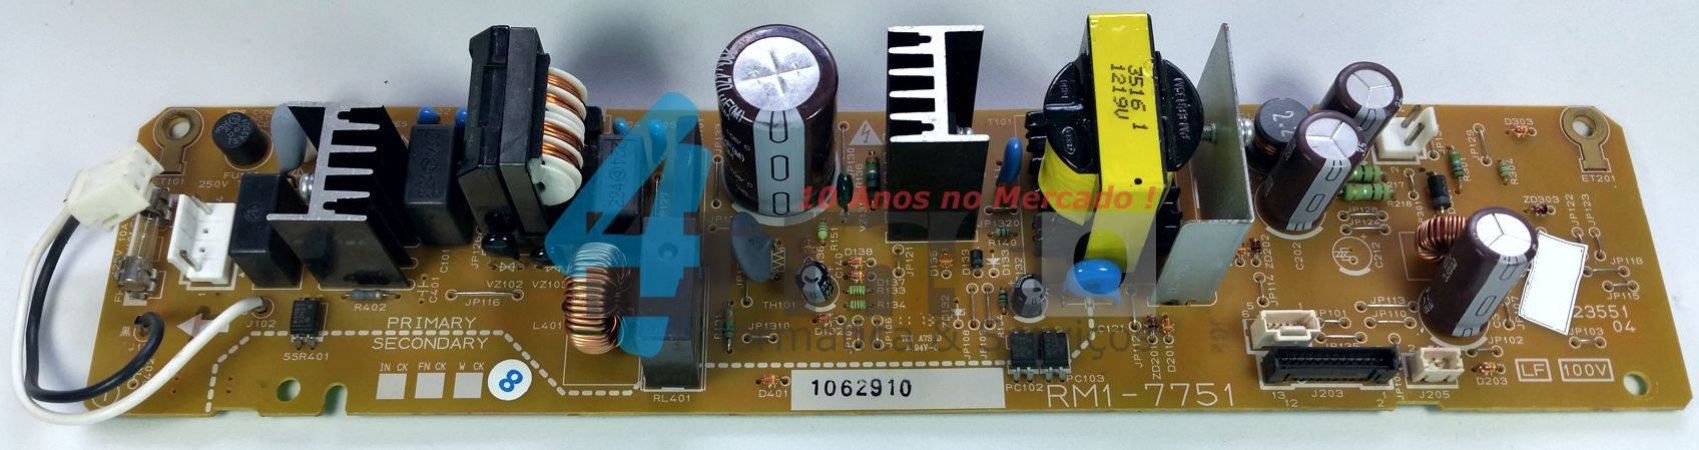 Placa Fonte HP LJ Color CP1025 110v LVPS RM1-7751